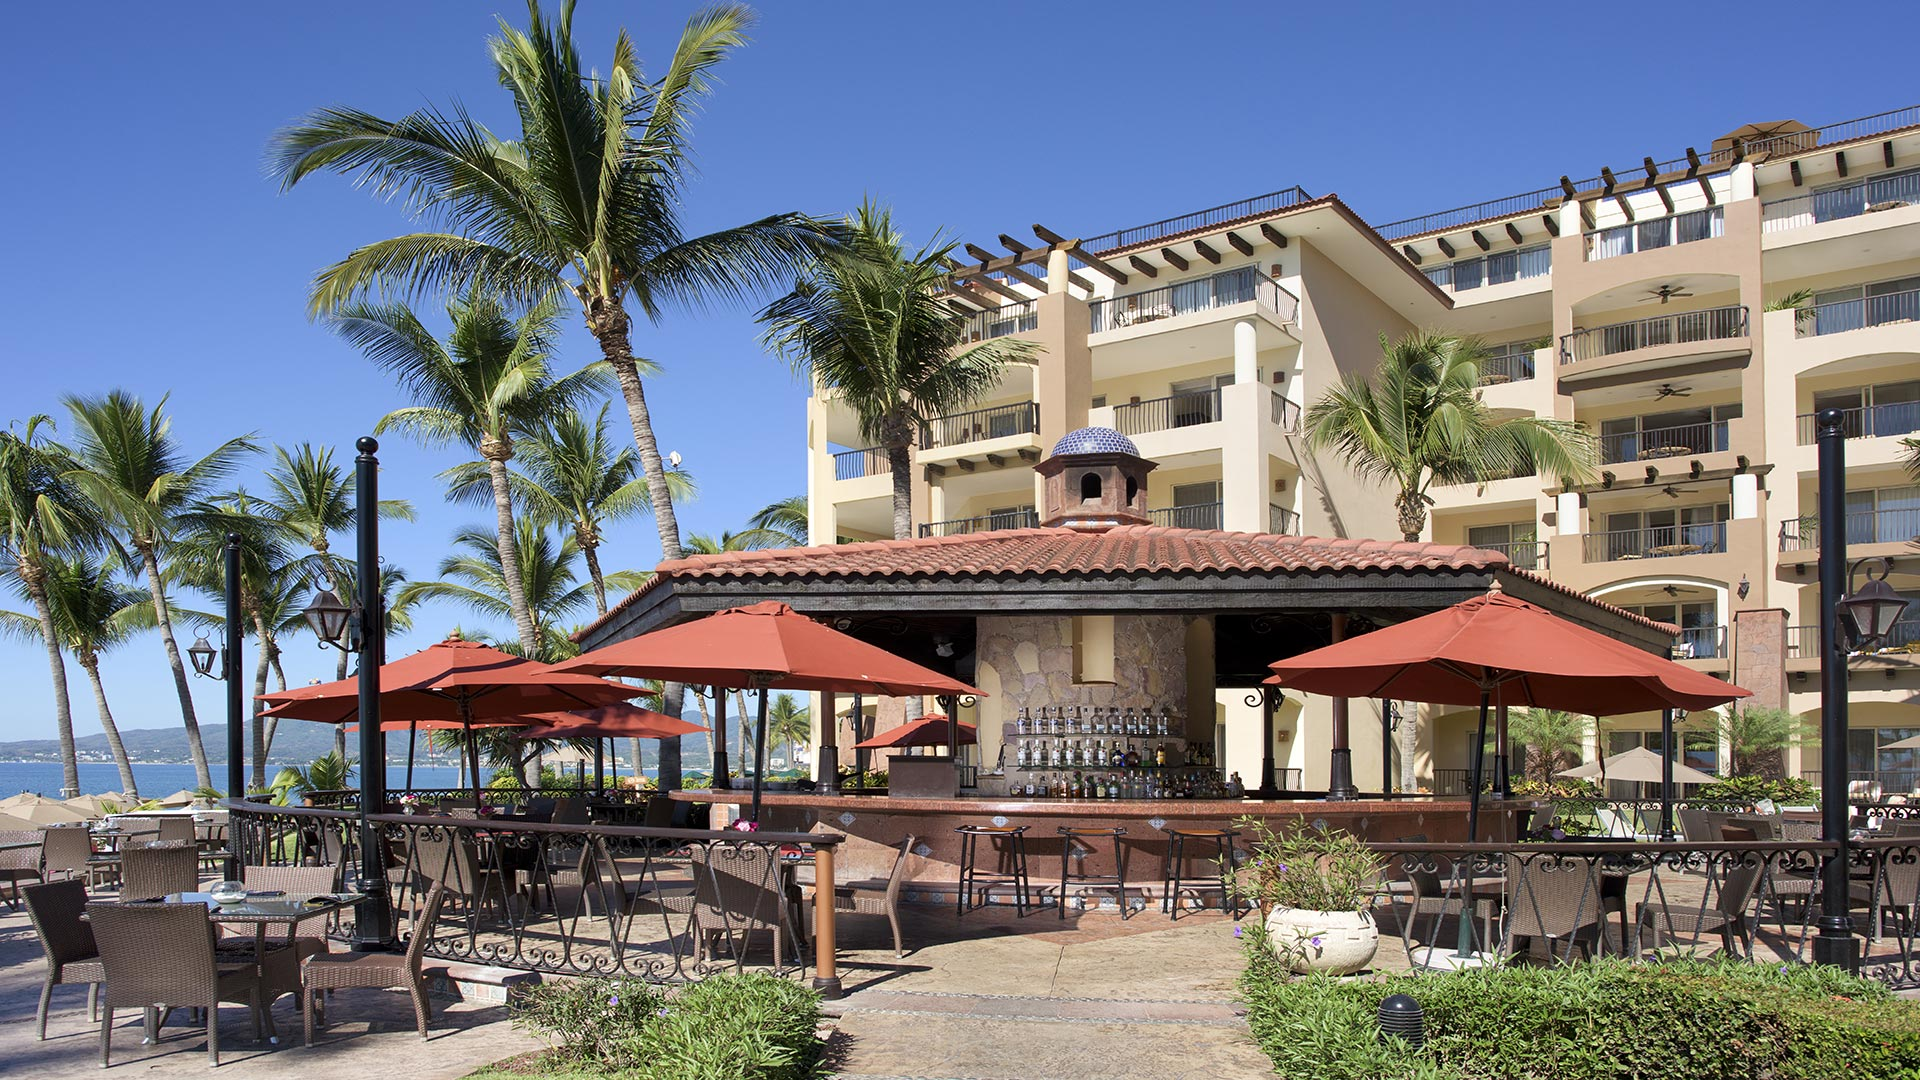 Villa del palmar flamingos riviera nayarit pizza bar 1